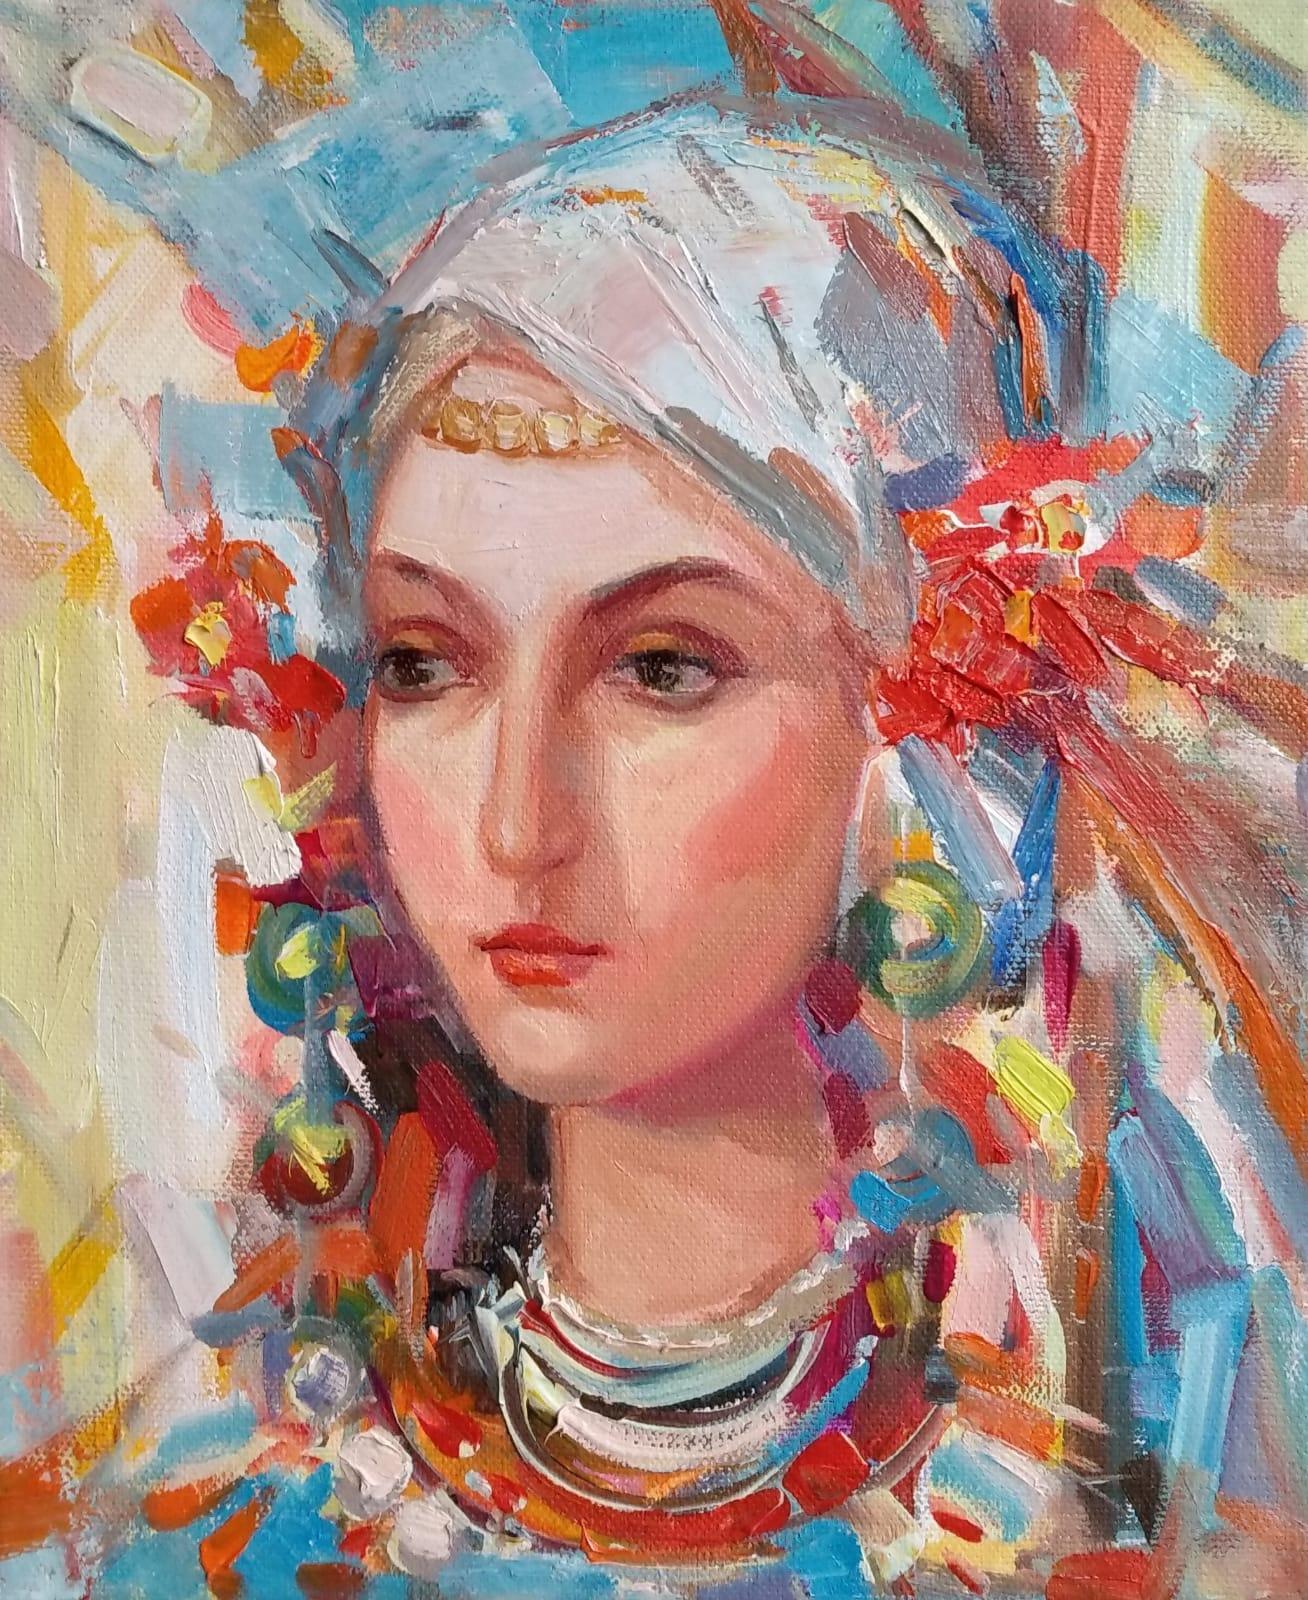 """Spring Girl"" Painting Angelina Nedin 2021"